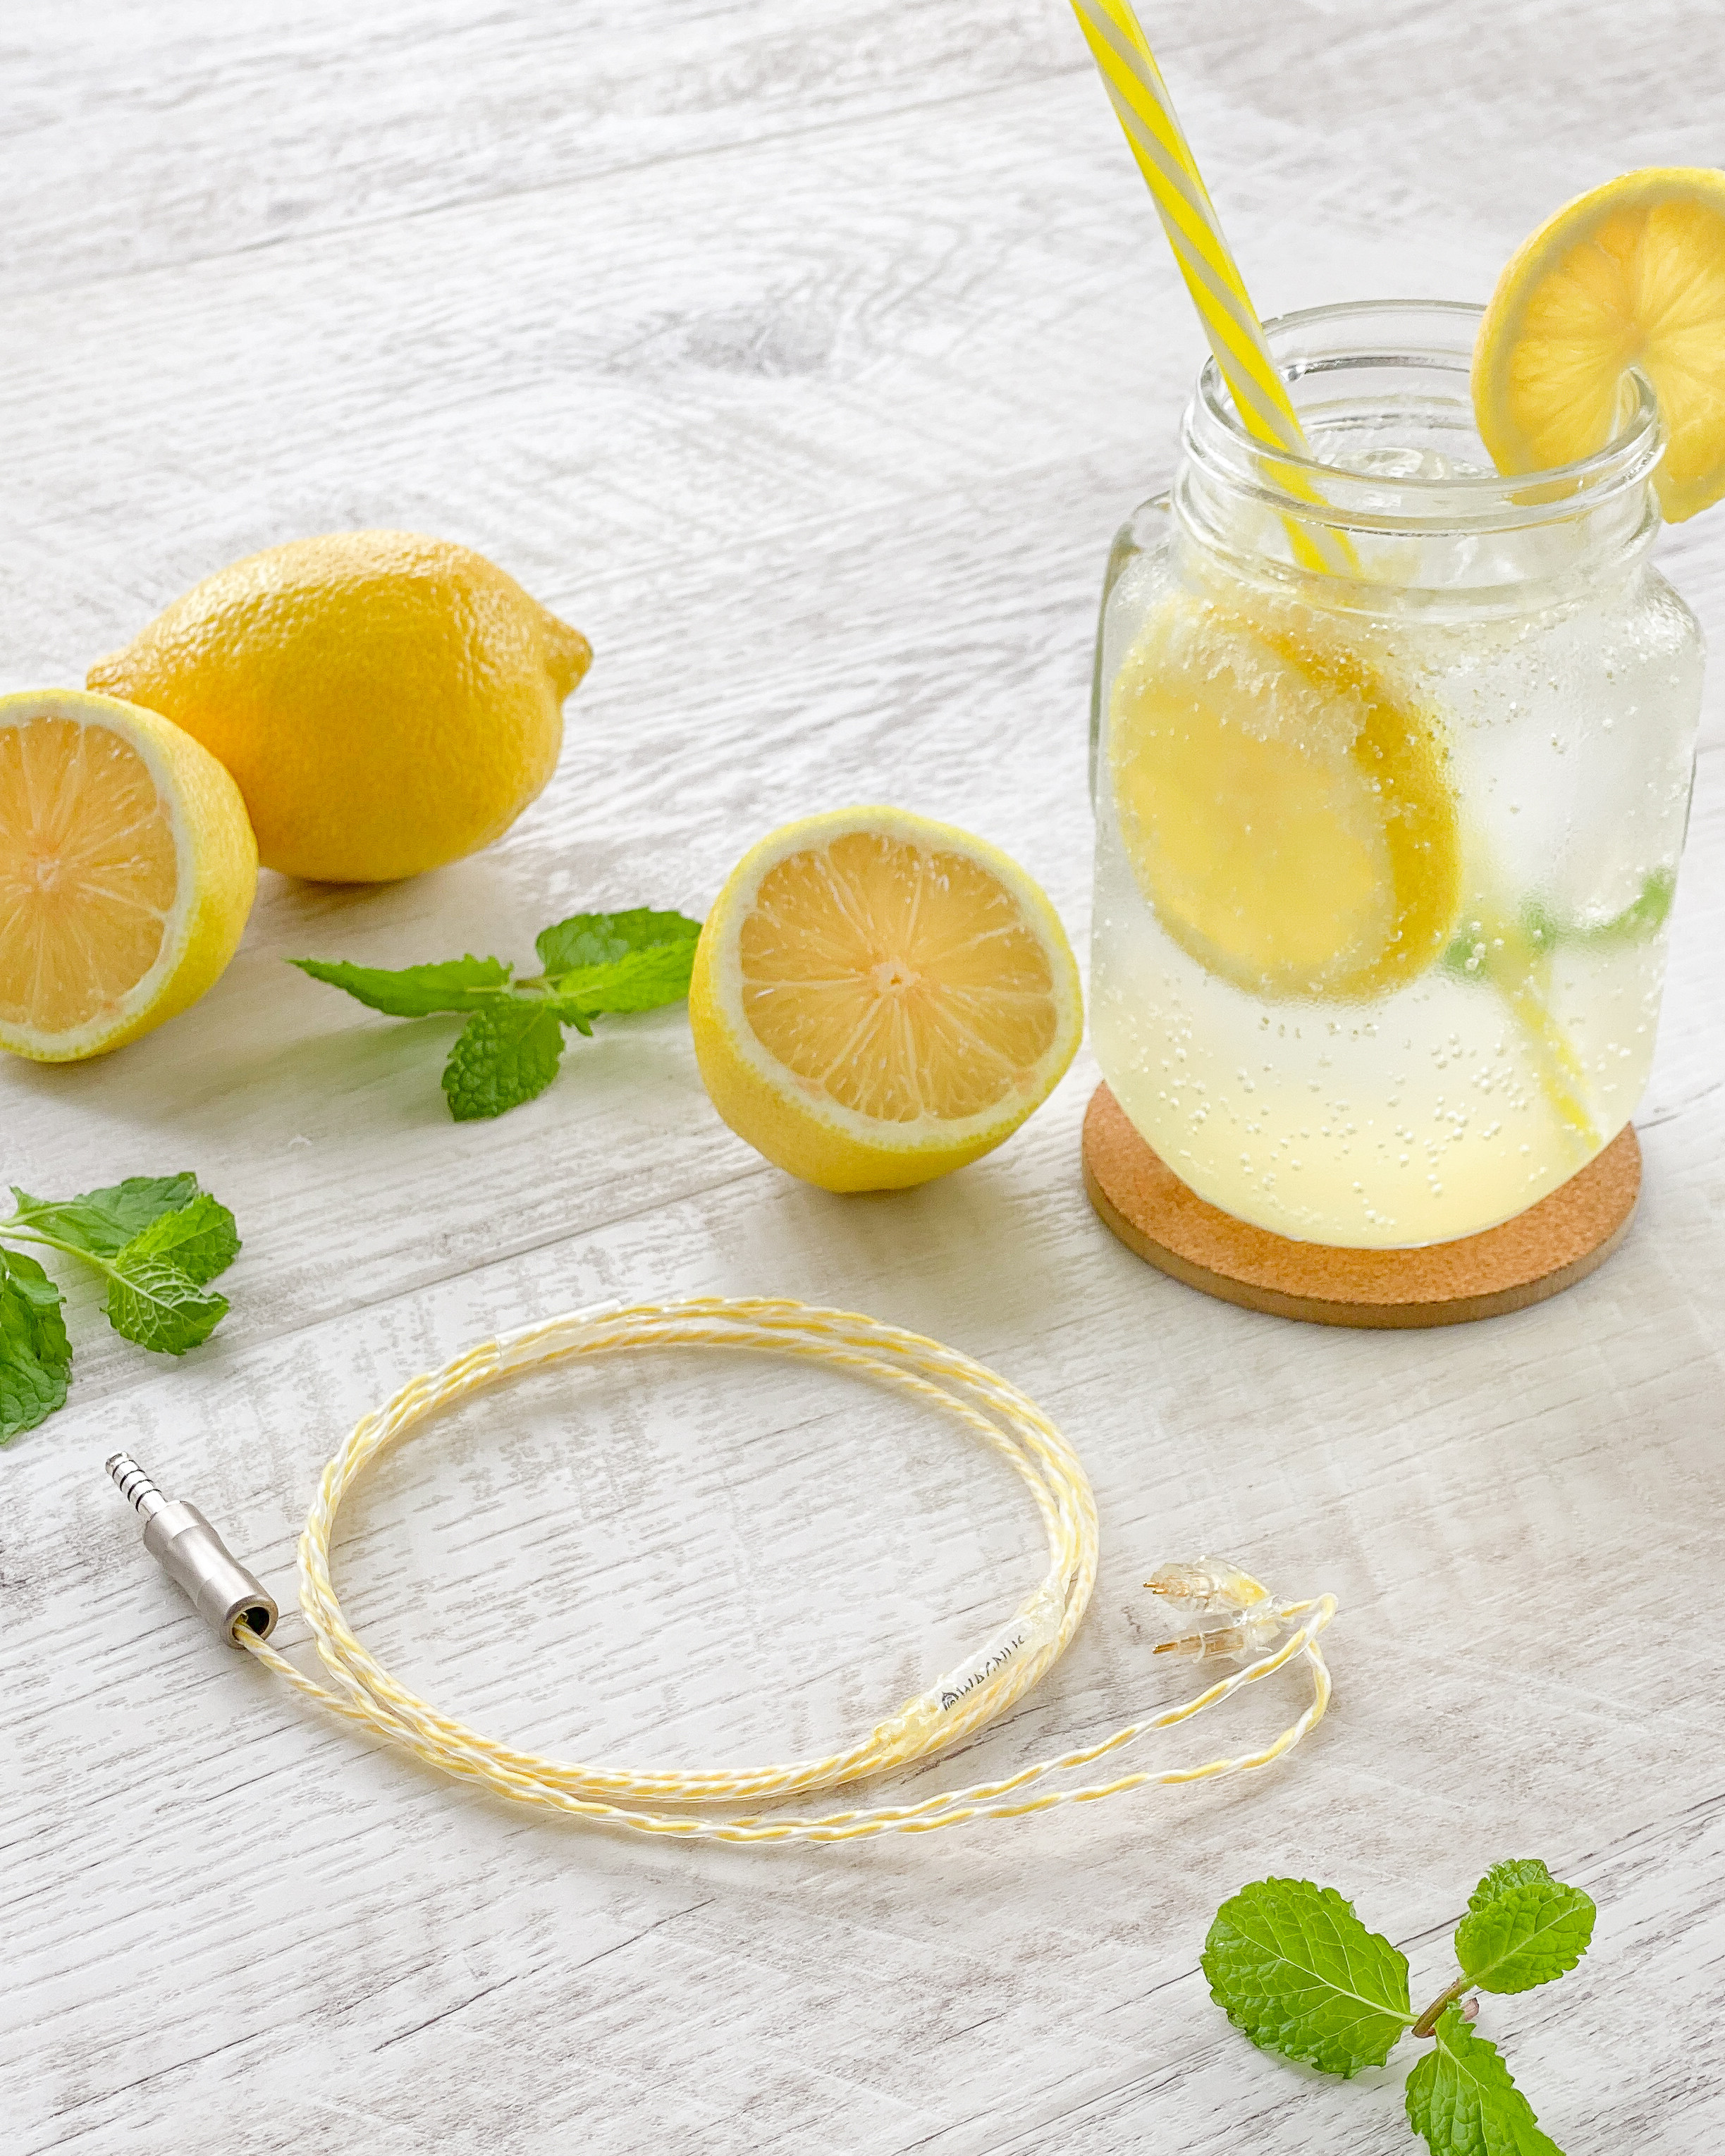 Lemonade Party 第1部 12:30-14:00